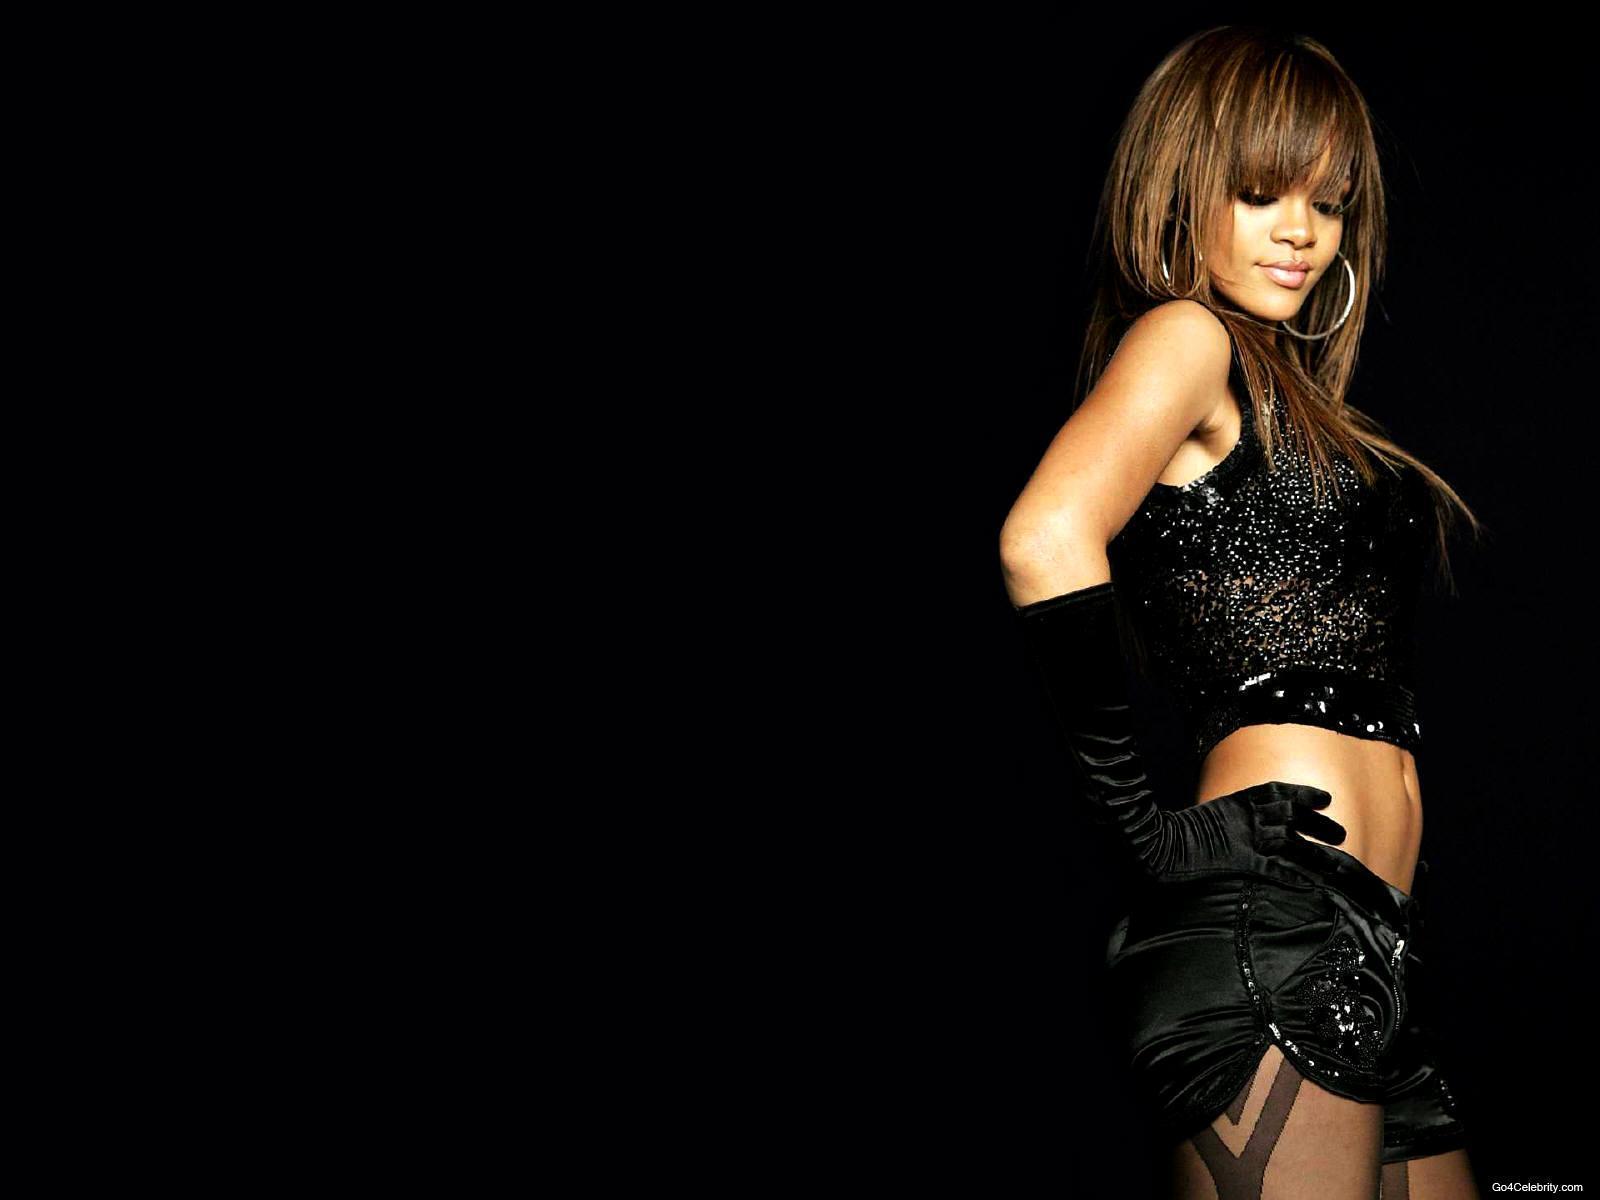 http://images2.fanpop.com/images/photos/6800000/Rihanna-rihanna-6848070-1600-1200.jpg